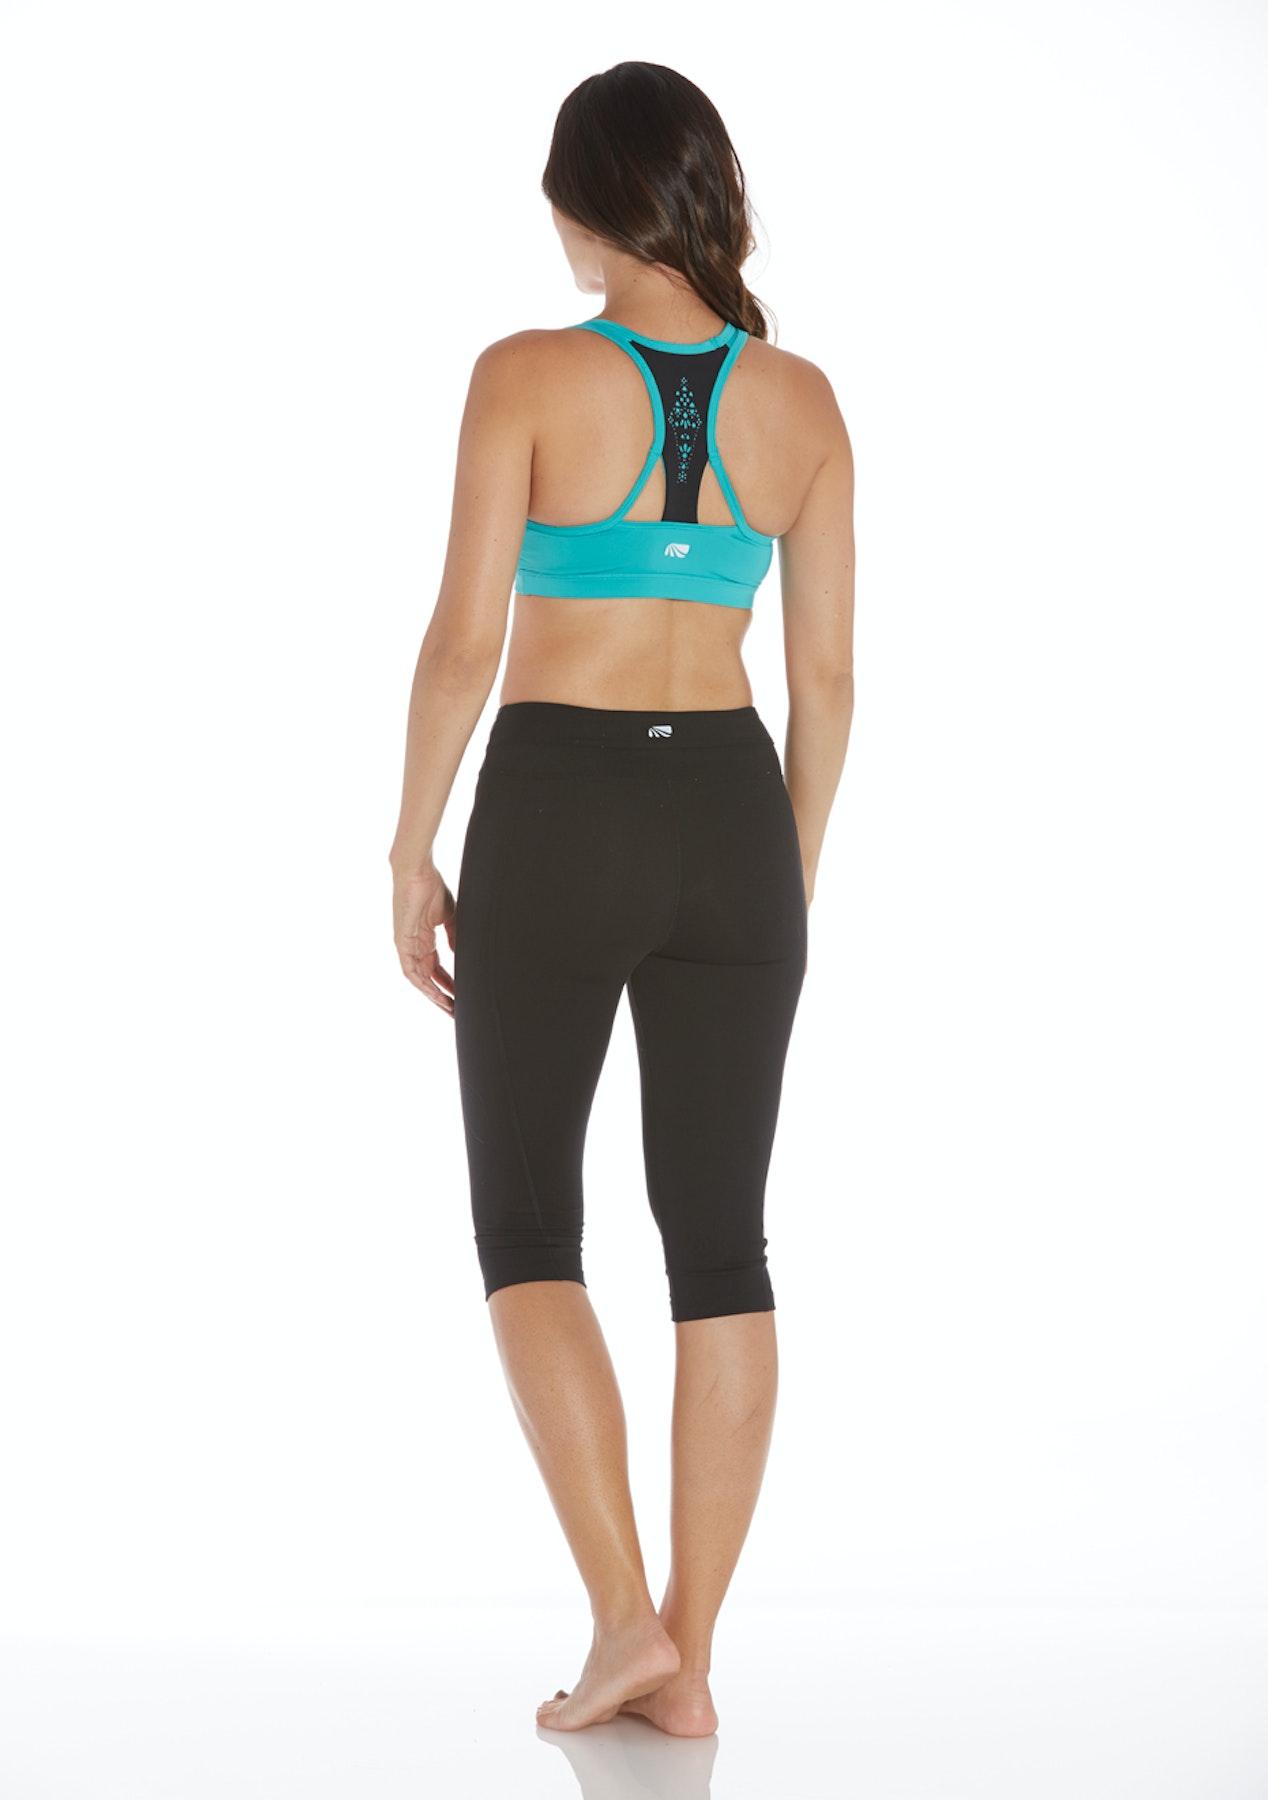 38d841728e775 Marika Tek - Sport Bra - Ceramic - Marika Activewear Up To 63% Off - Onceit